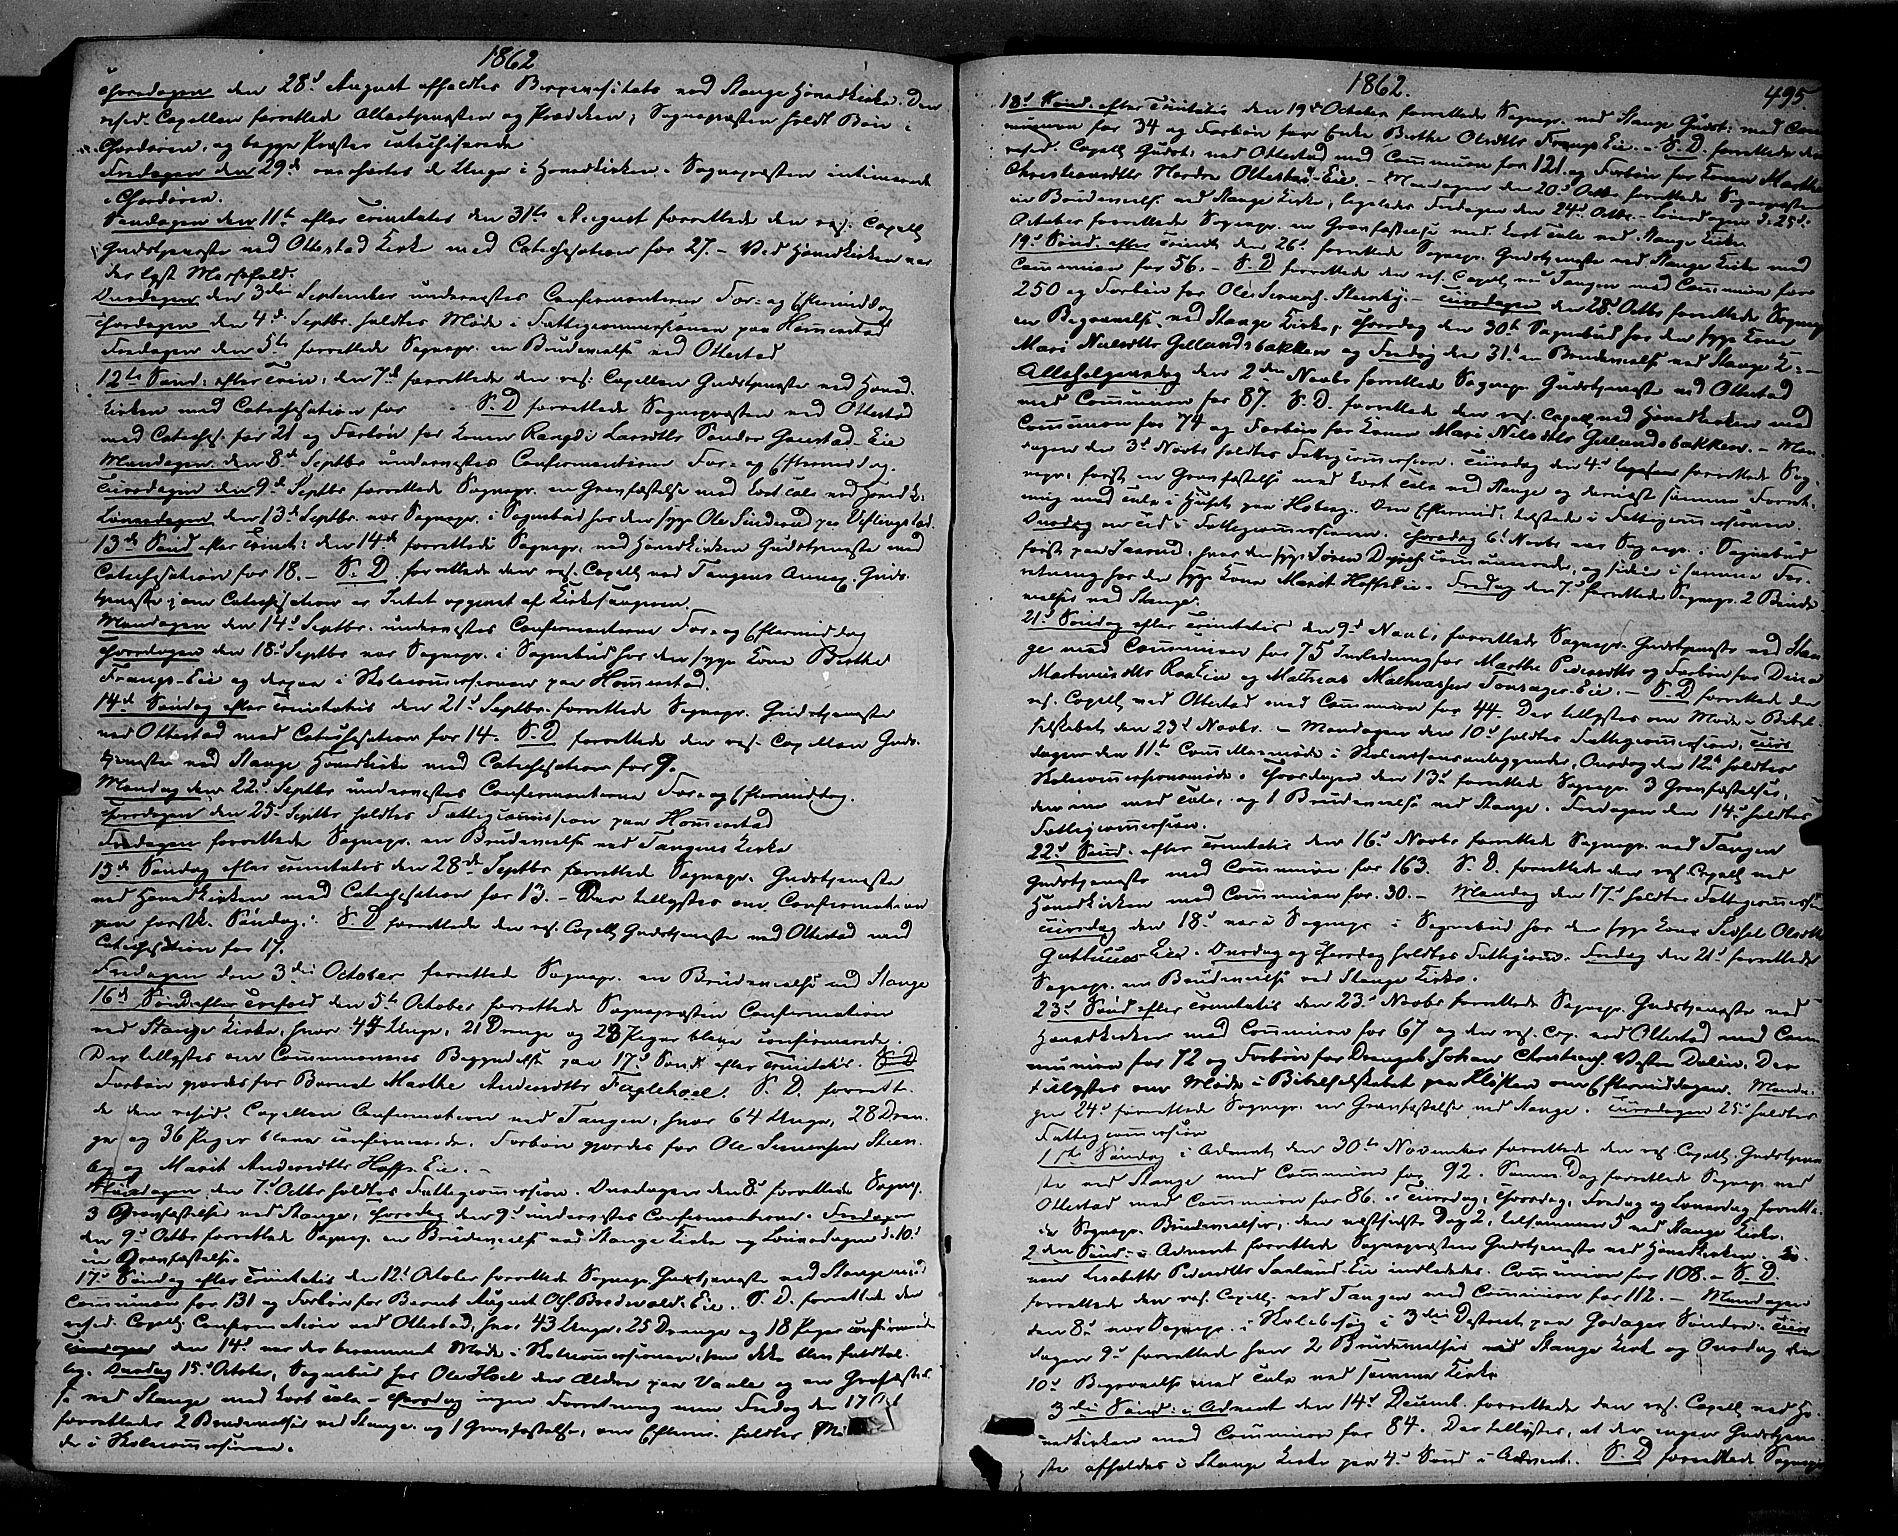 SAH, Stange prestekontor, K/L0013: Ministerialbok nr. 13, 1862-1879, s. 495